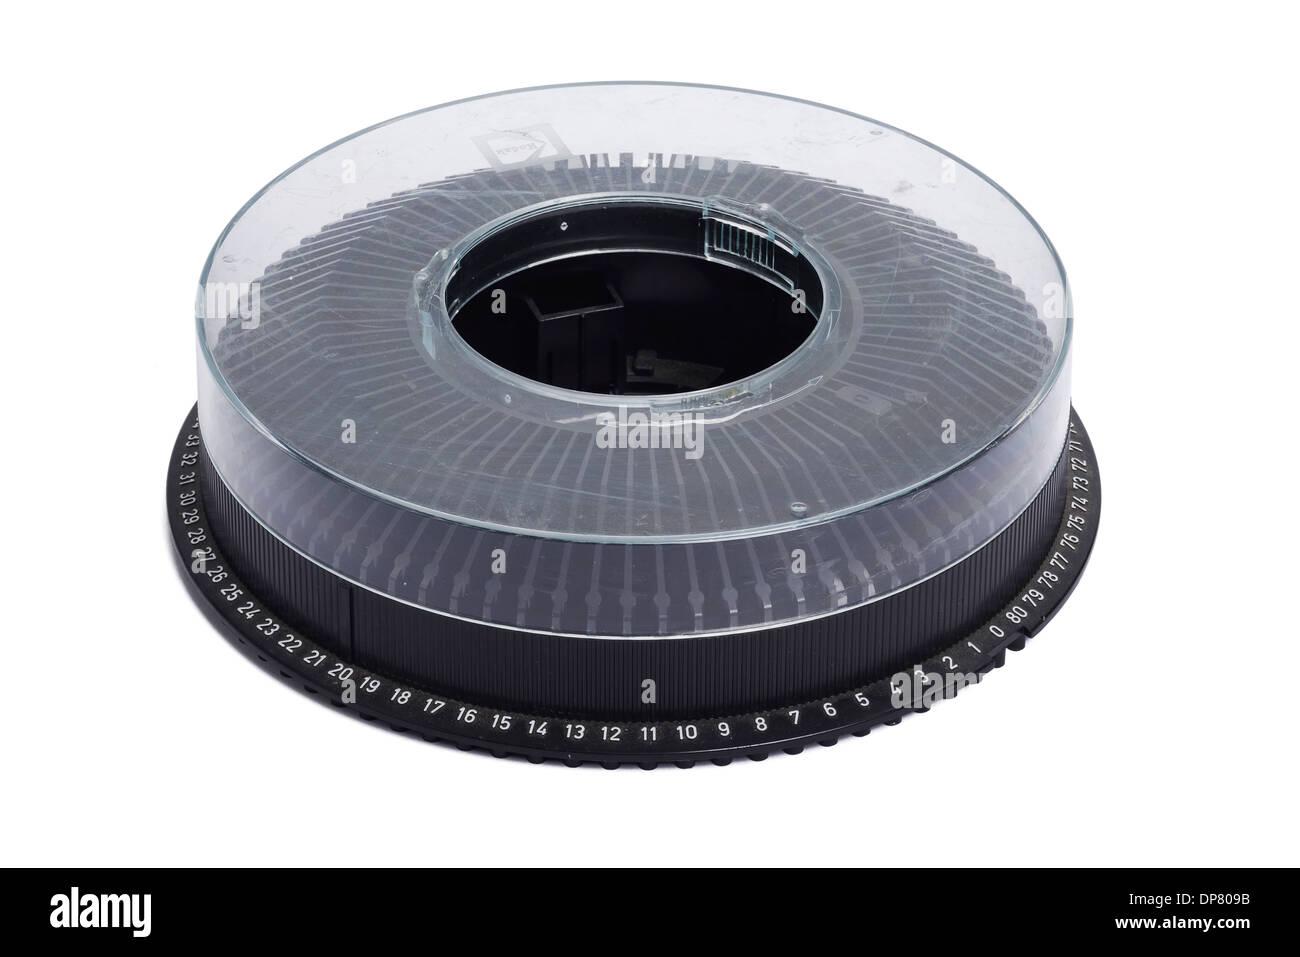 Kodak Carousel plastic circular slide tray for a slide projector - Stock Image